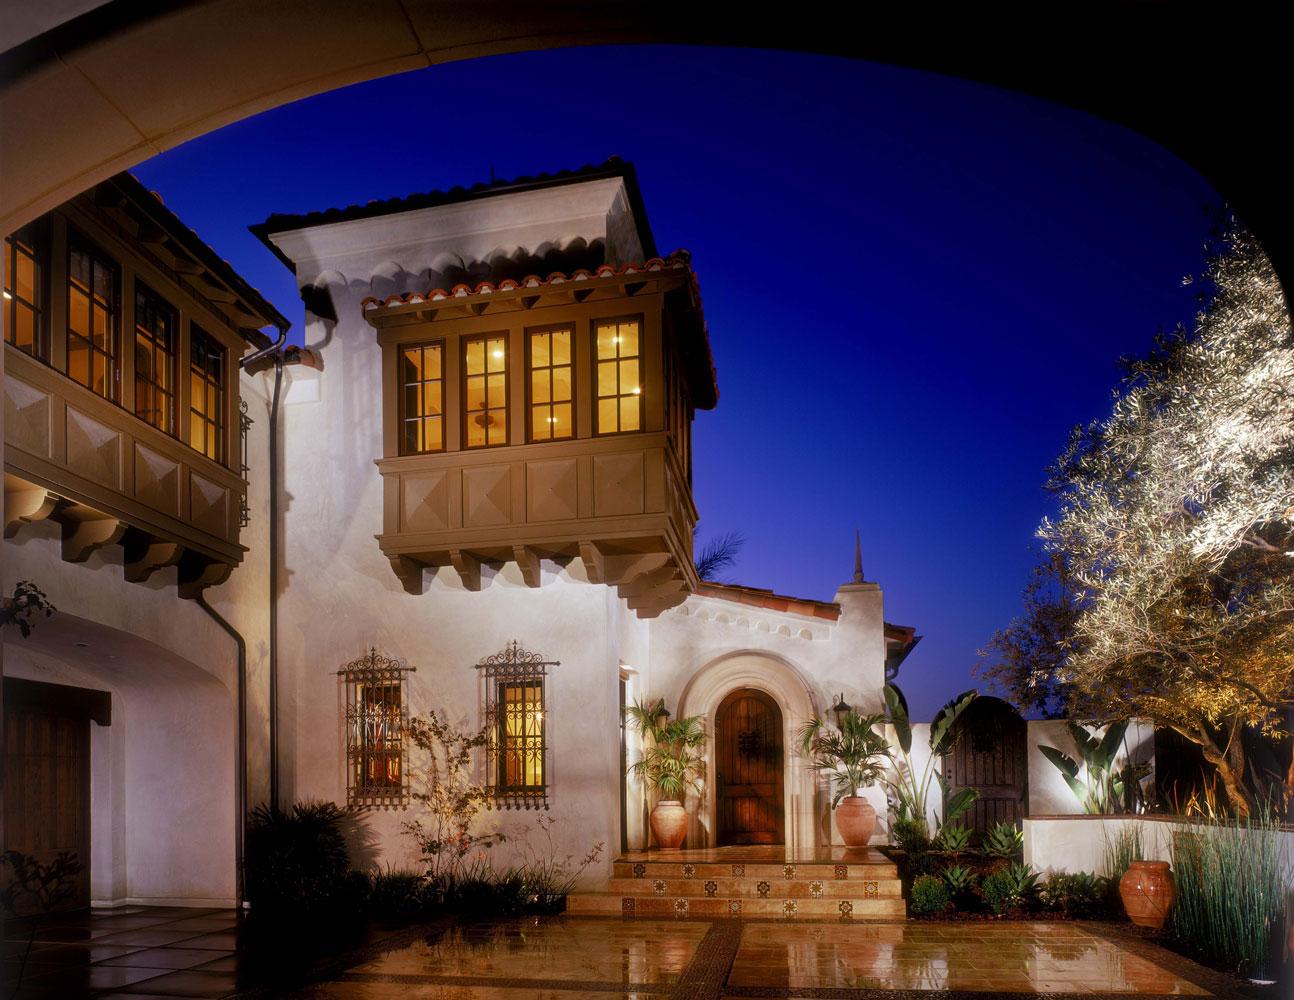 Contemporary-Spanish-Front-Facade-Oriel-Window-Corbin-Reeves.jpg